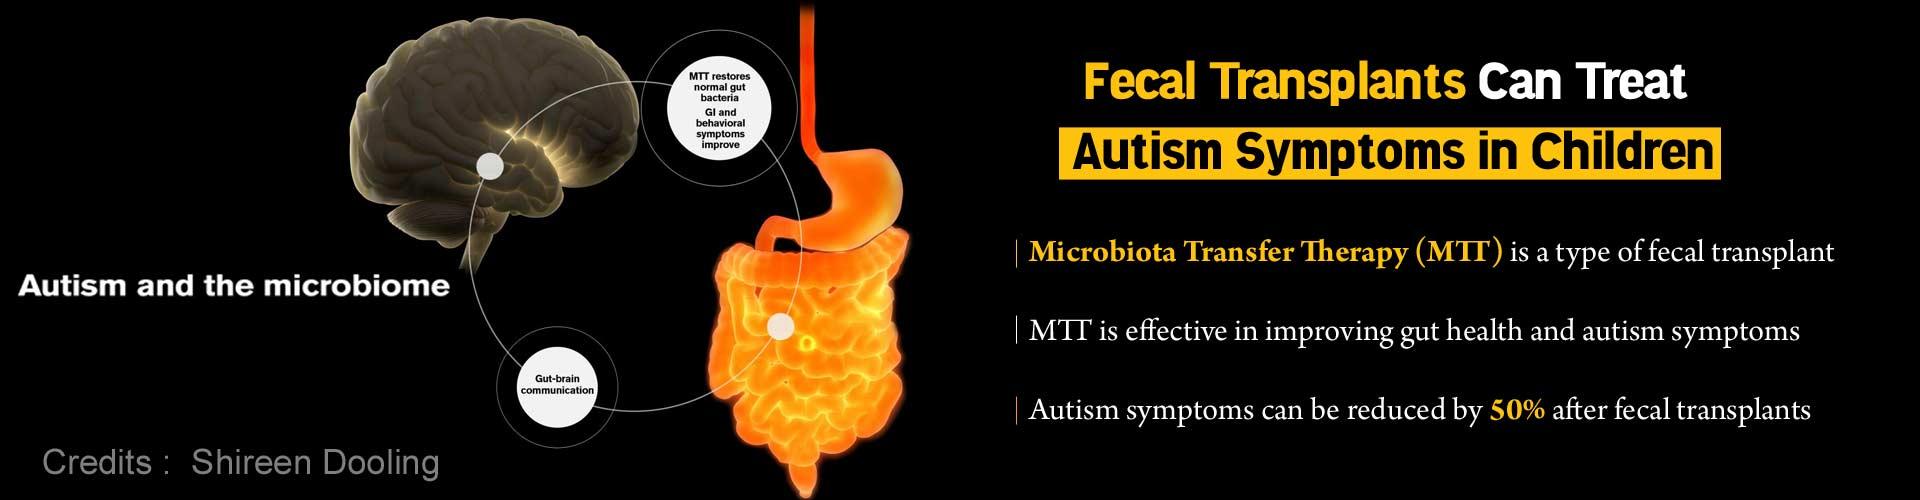 Fecal Transplants Help Reduce Autism Symptoms by Half